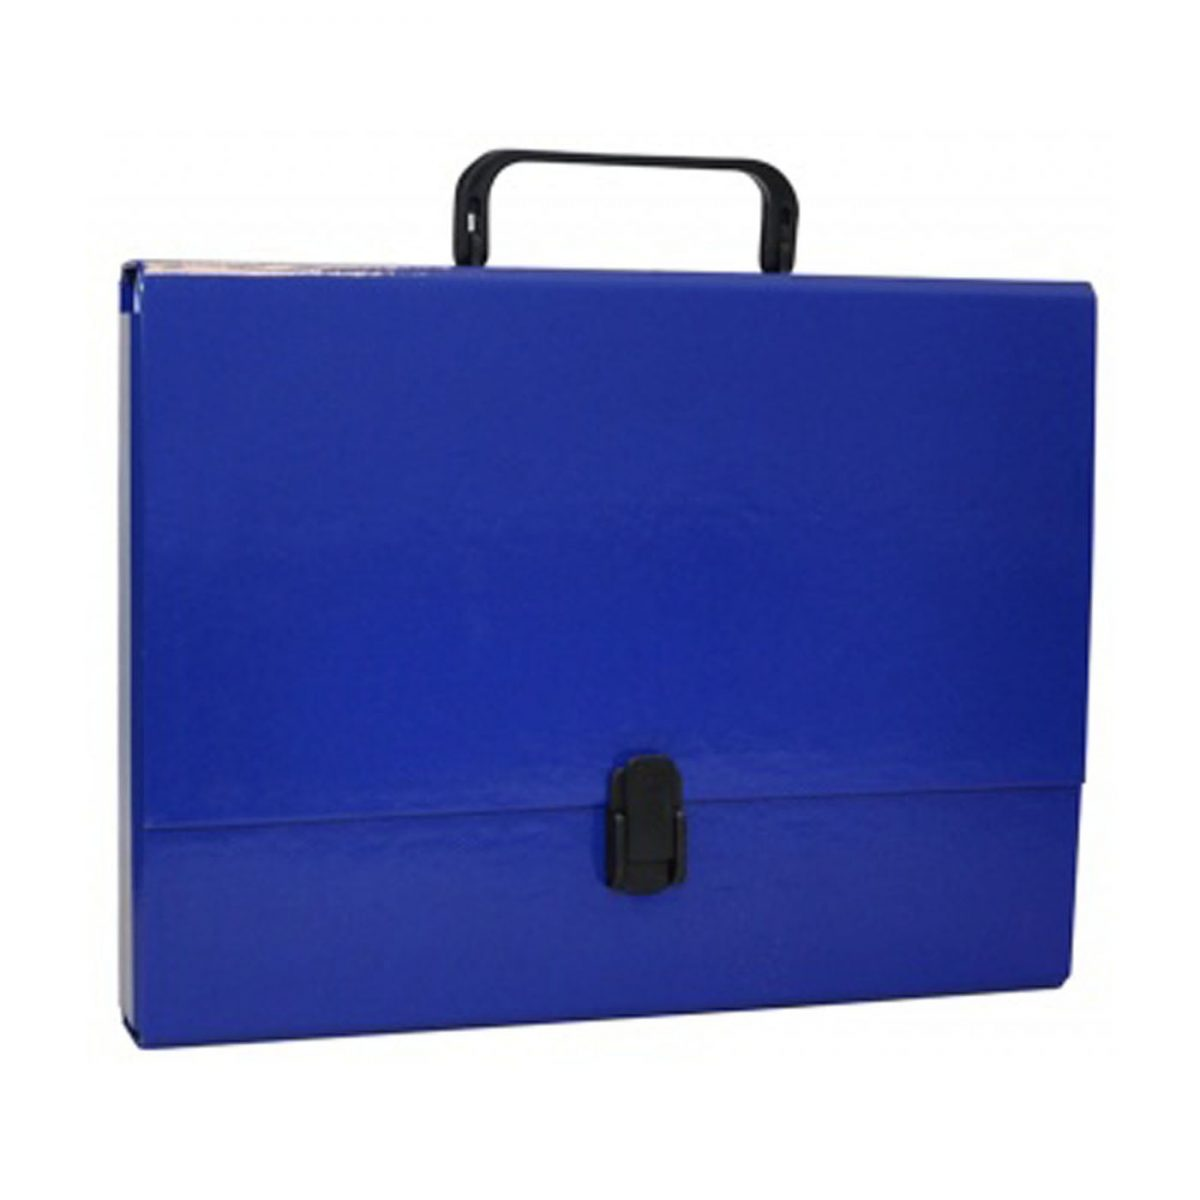 Servieta din carton laminat, A4/5cm, cu inchidere si maner, Office Products - bleumarin